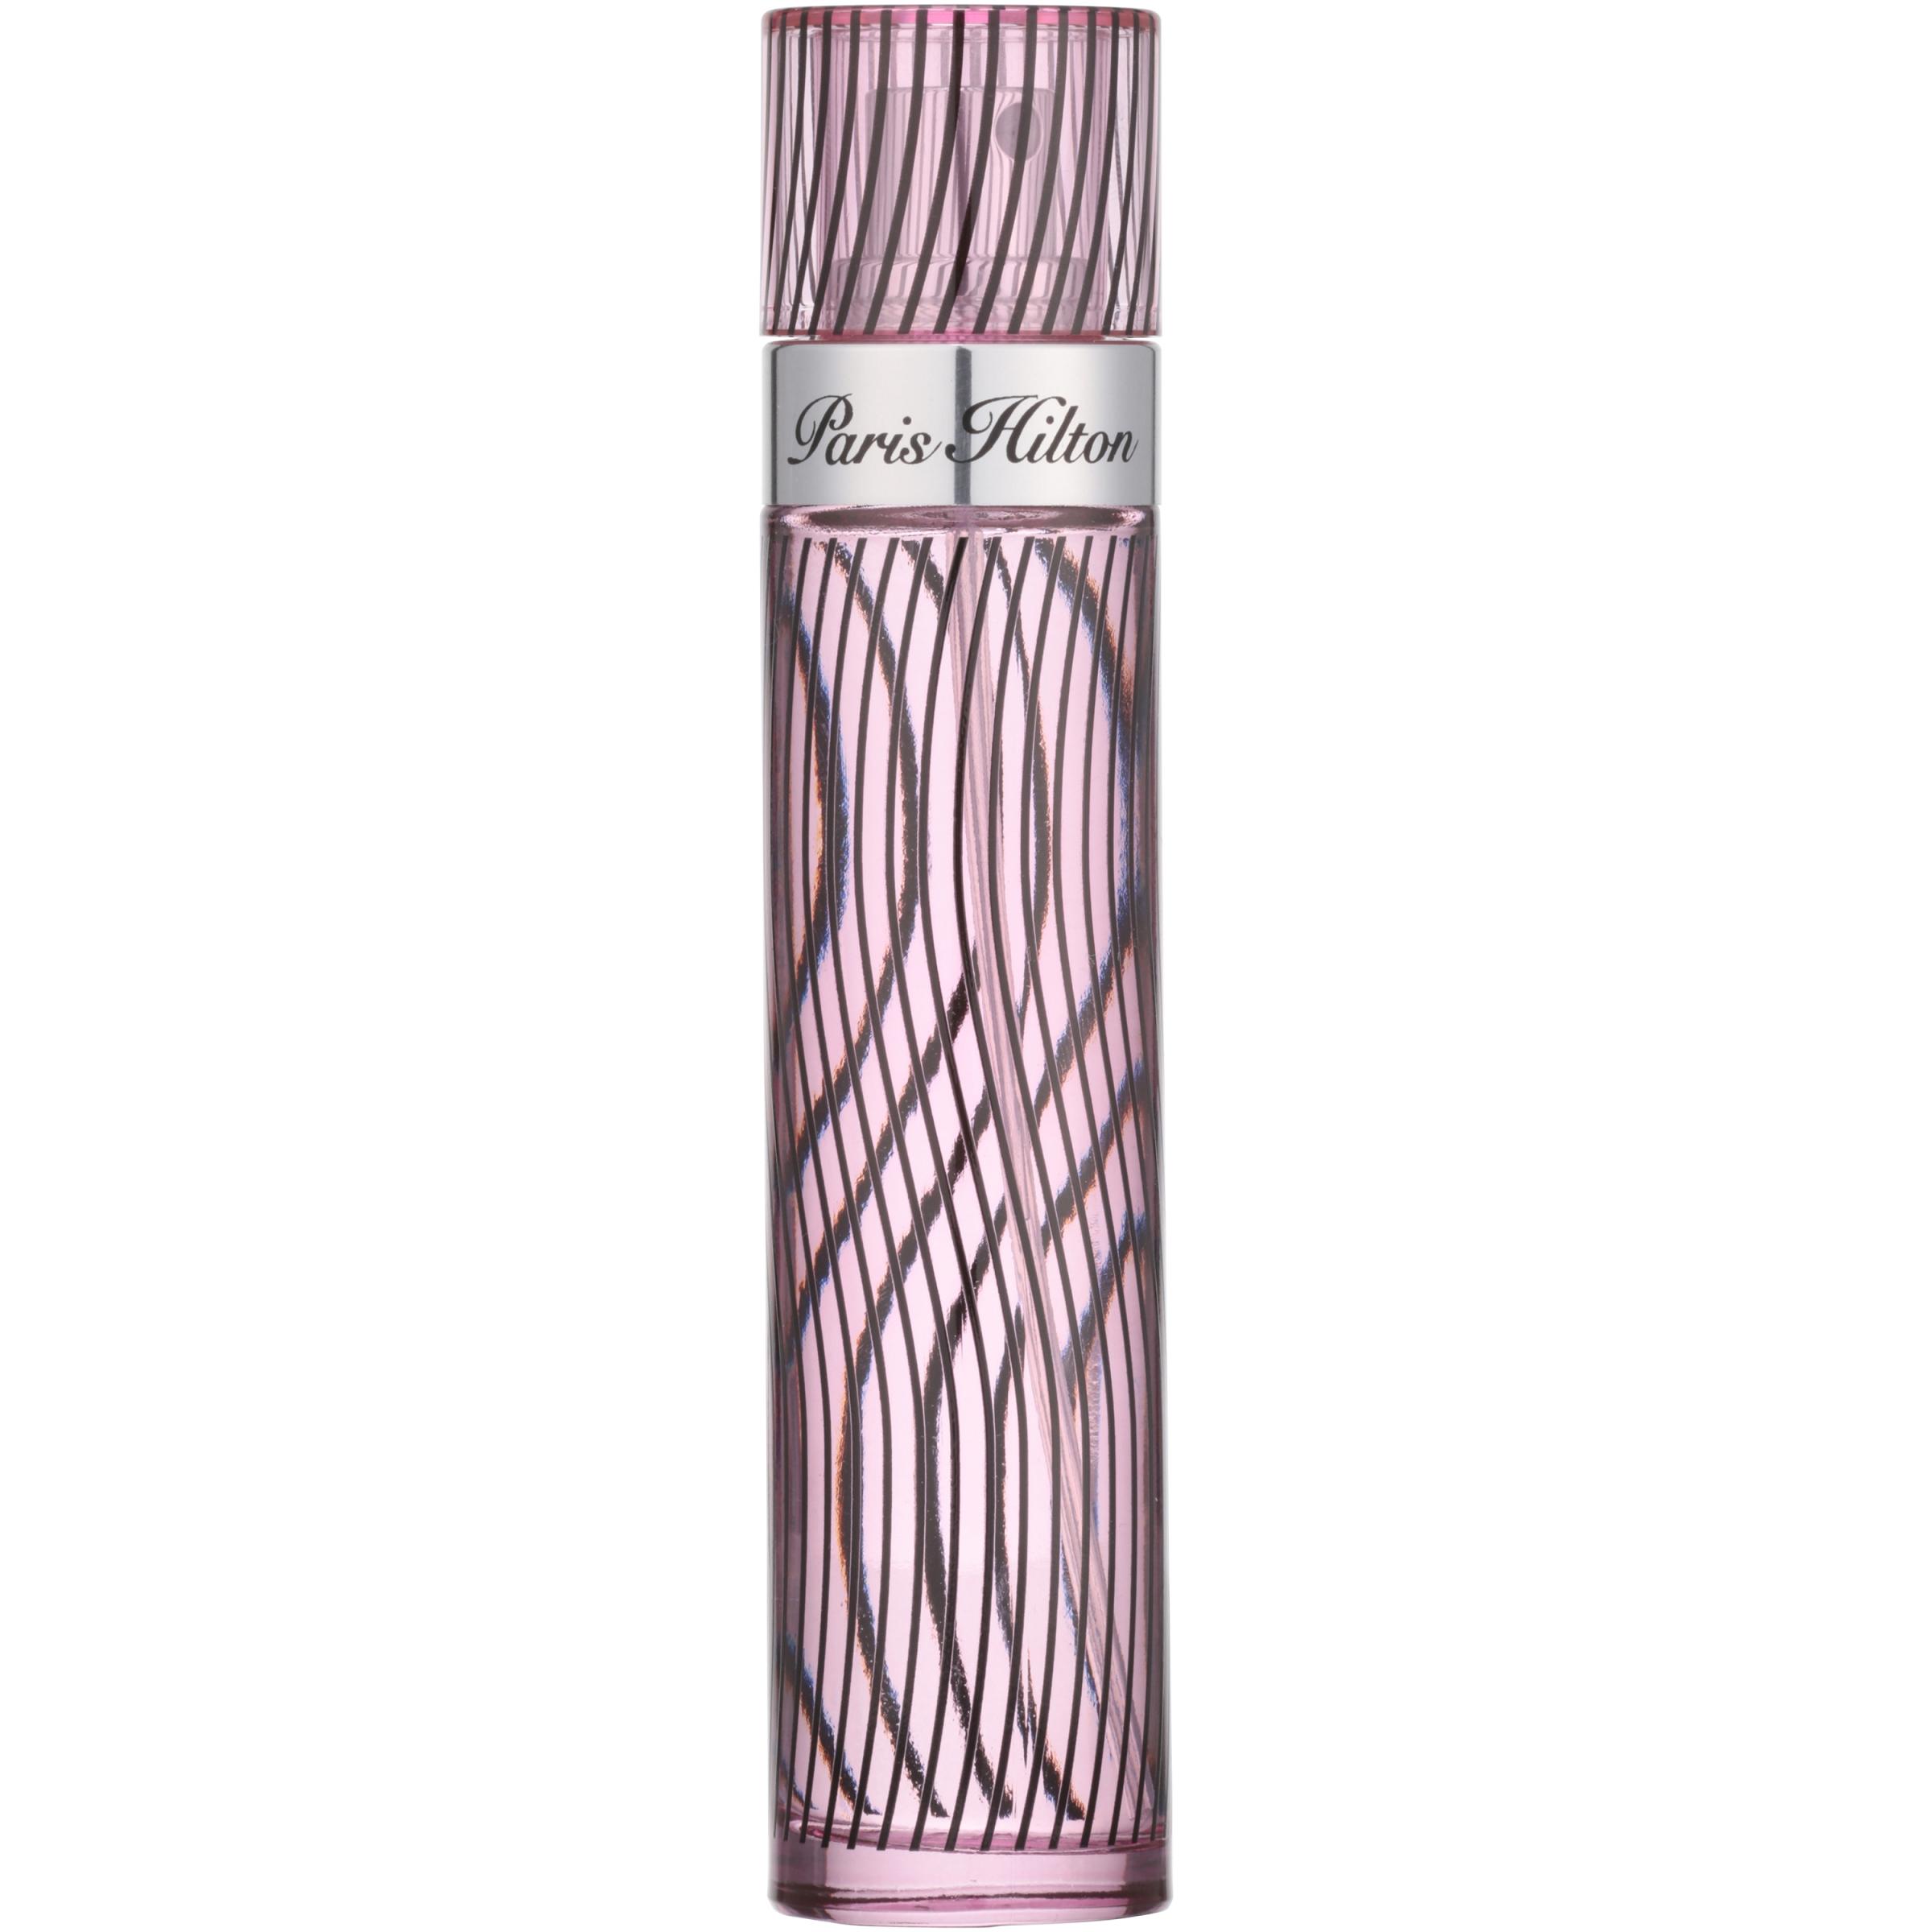 Paris Hilton® Eau de Parfum Spray 1.7 fl. oz. Box